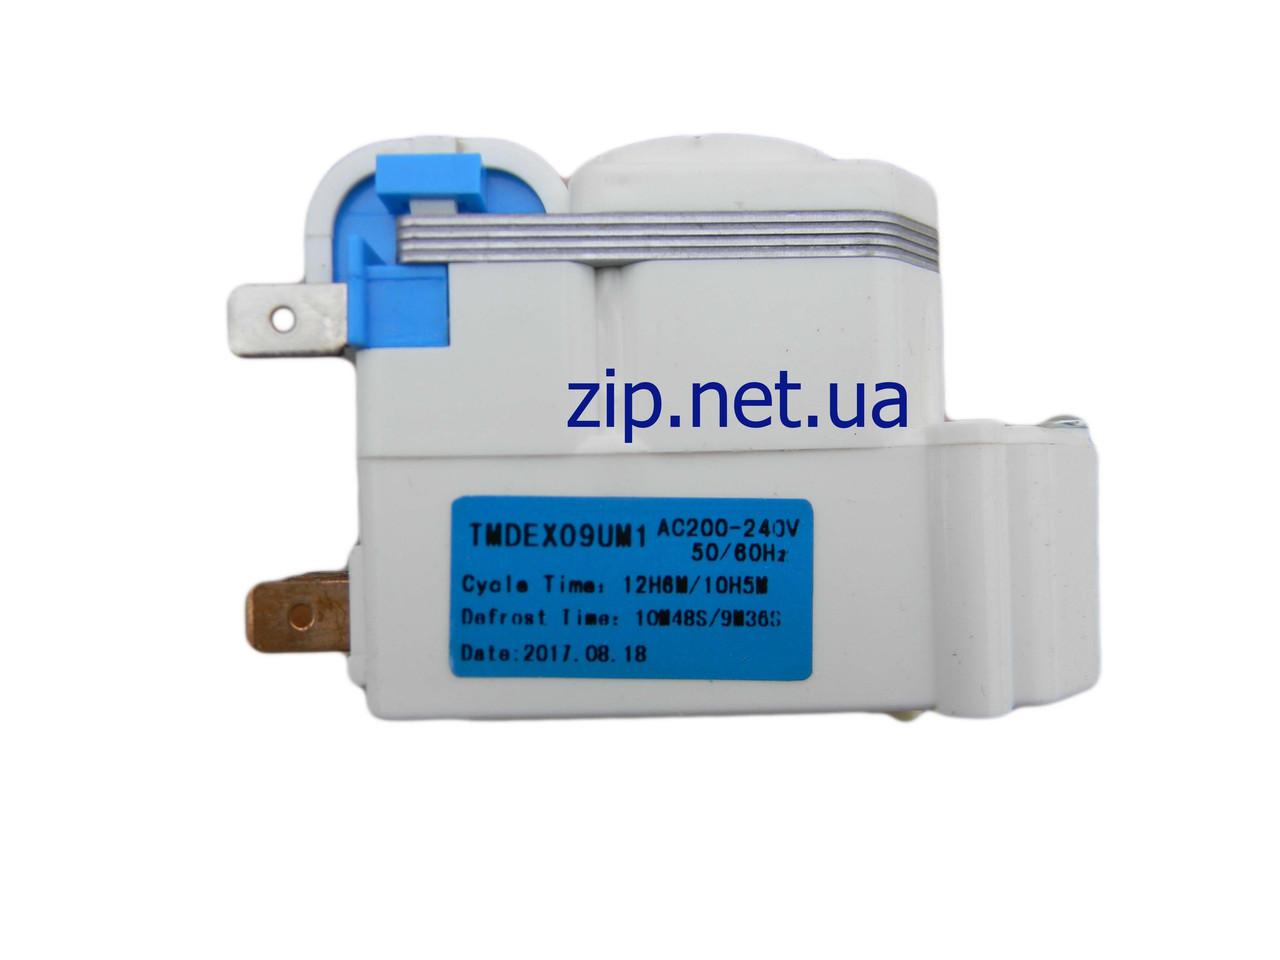 Таймер разморозки для холодильника TMDEX-09 UMN1